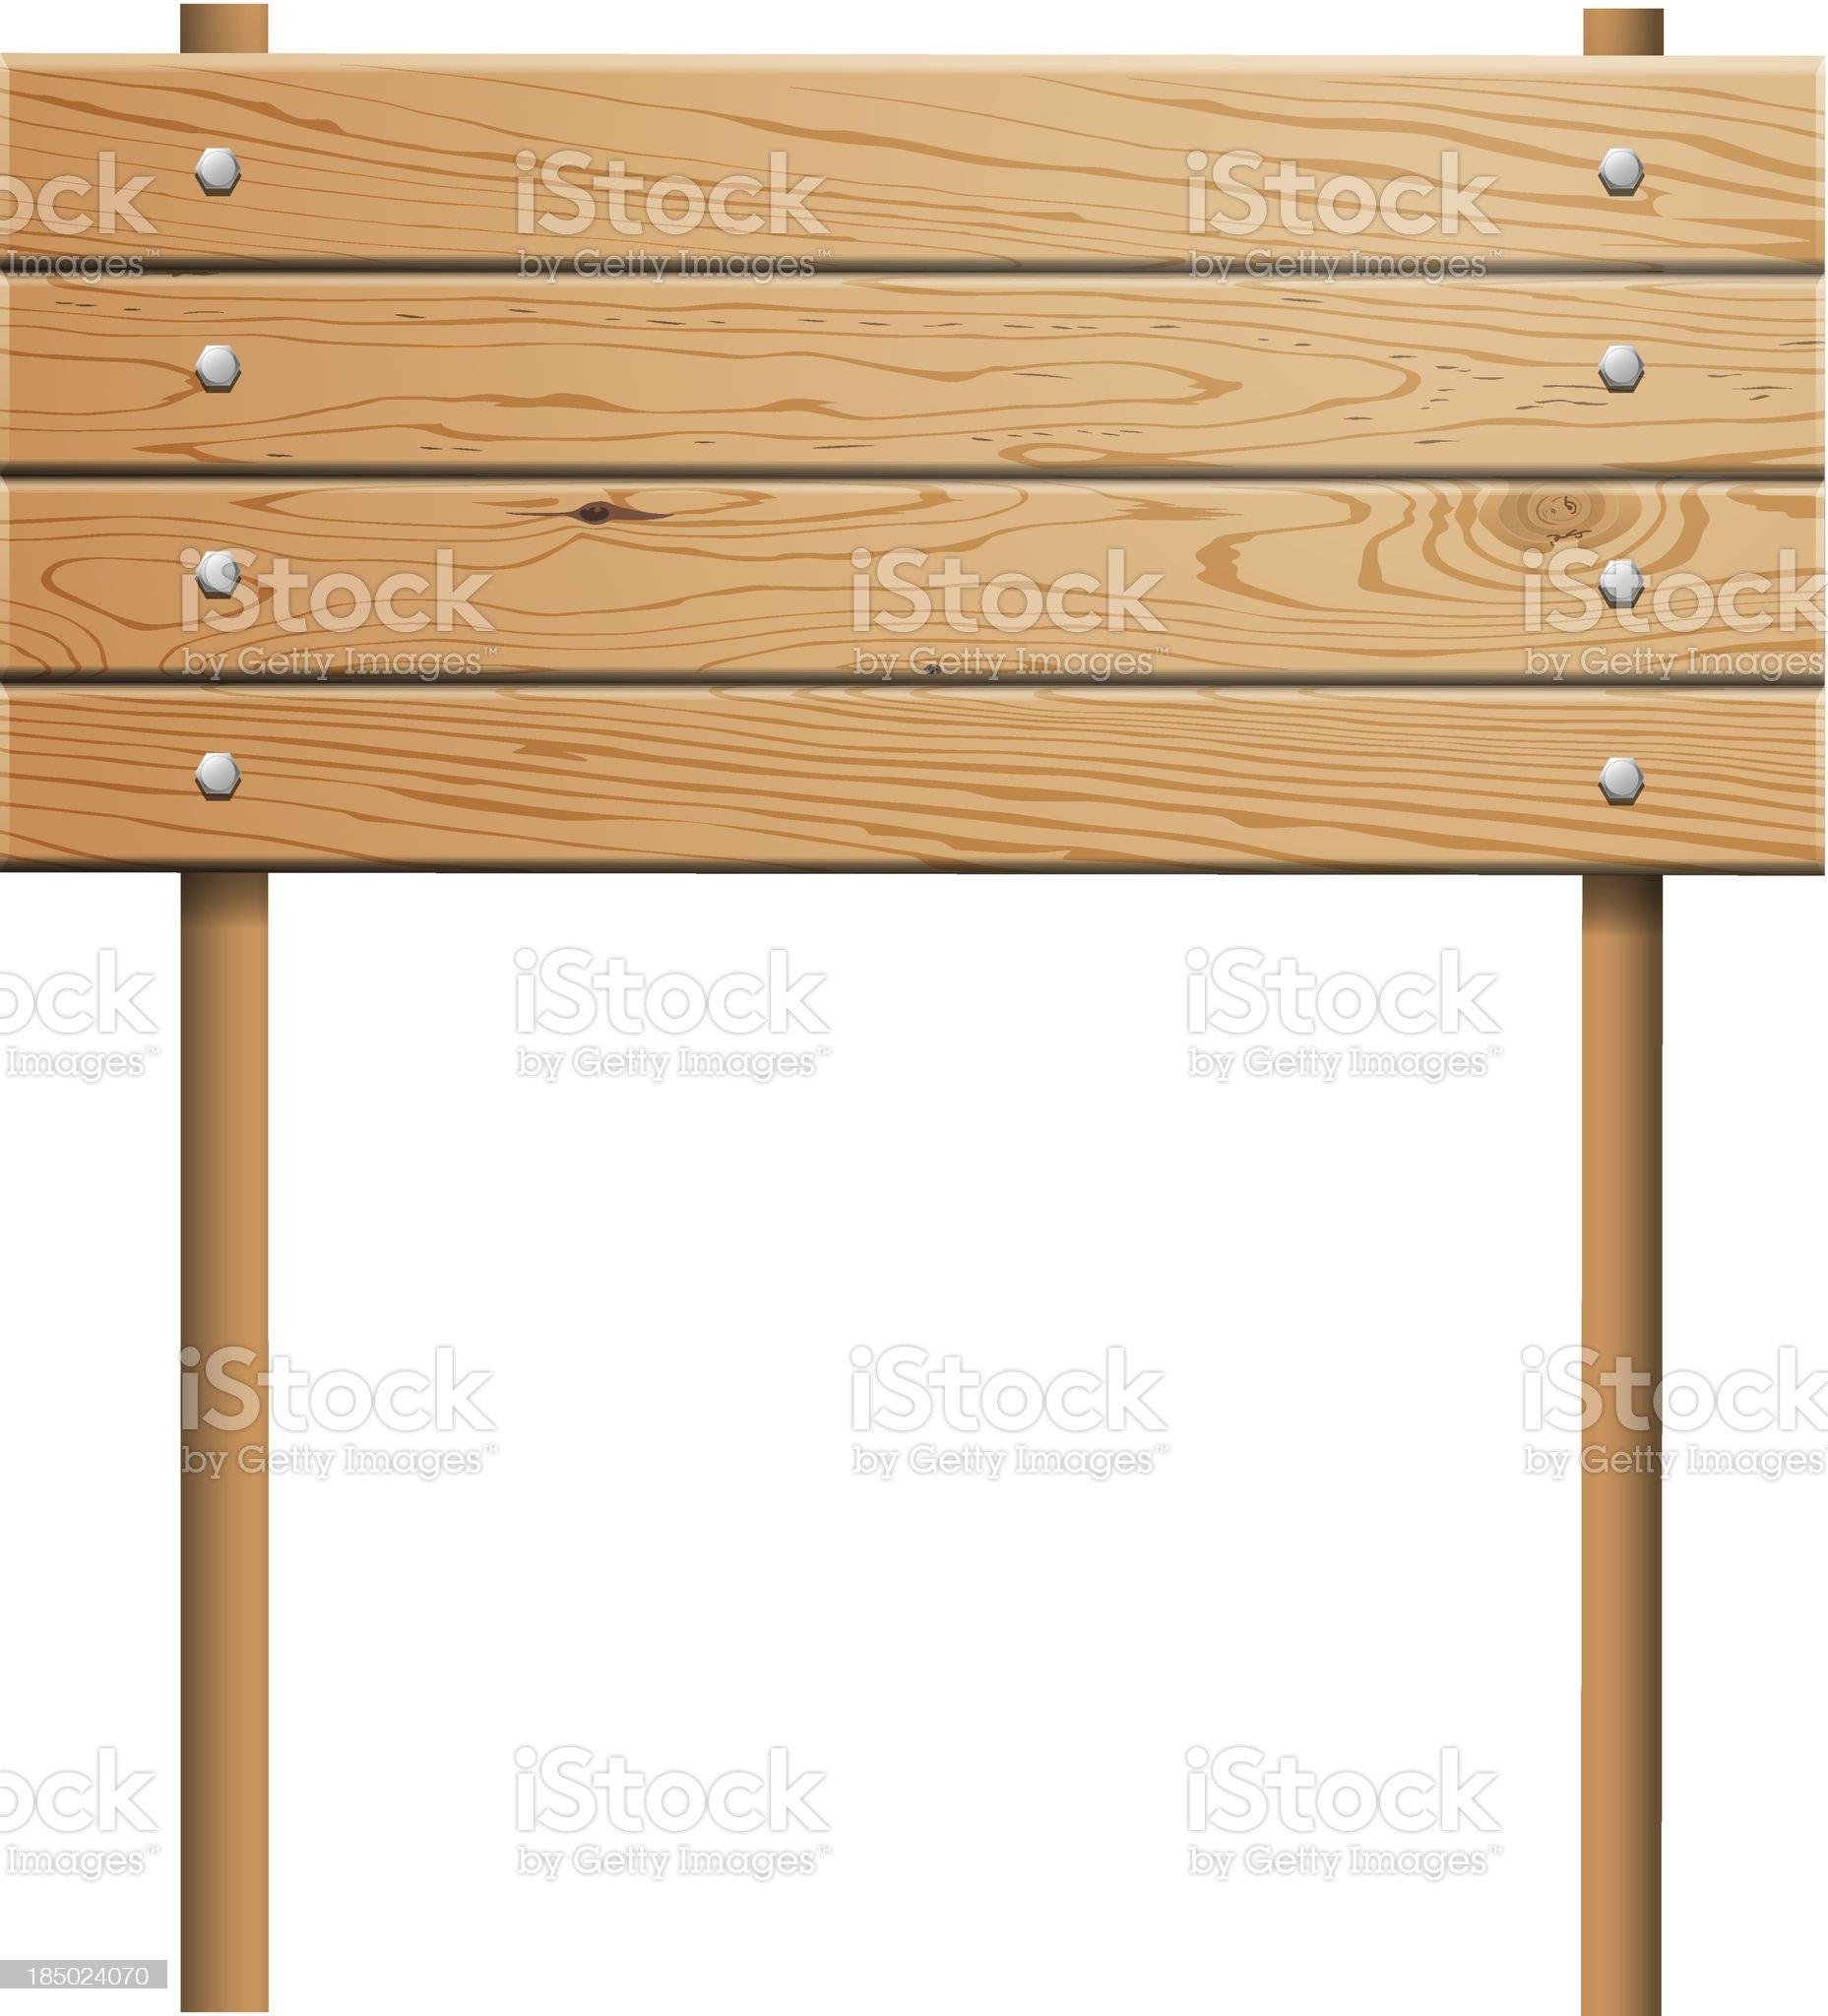 Vector wooden billboard royalty-free stock vector art